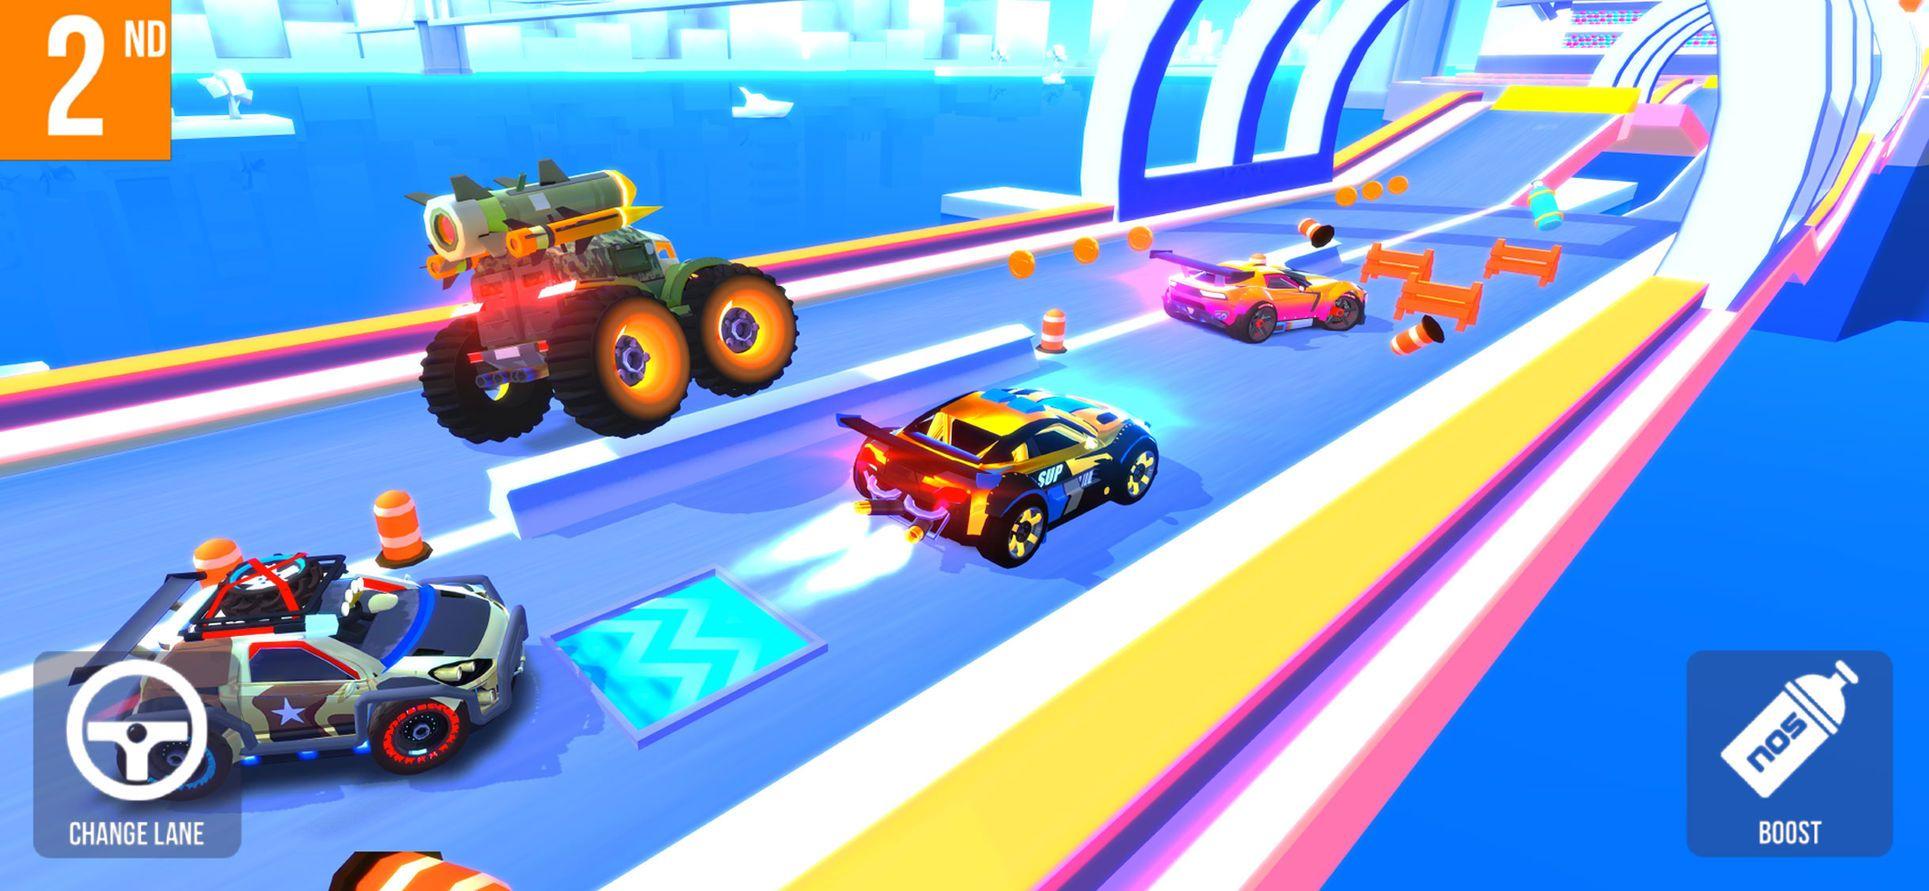 SUP Multiplayer Racing iosArcadeappapps Racing